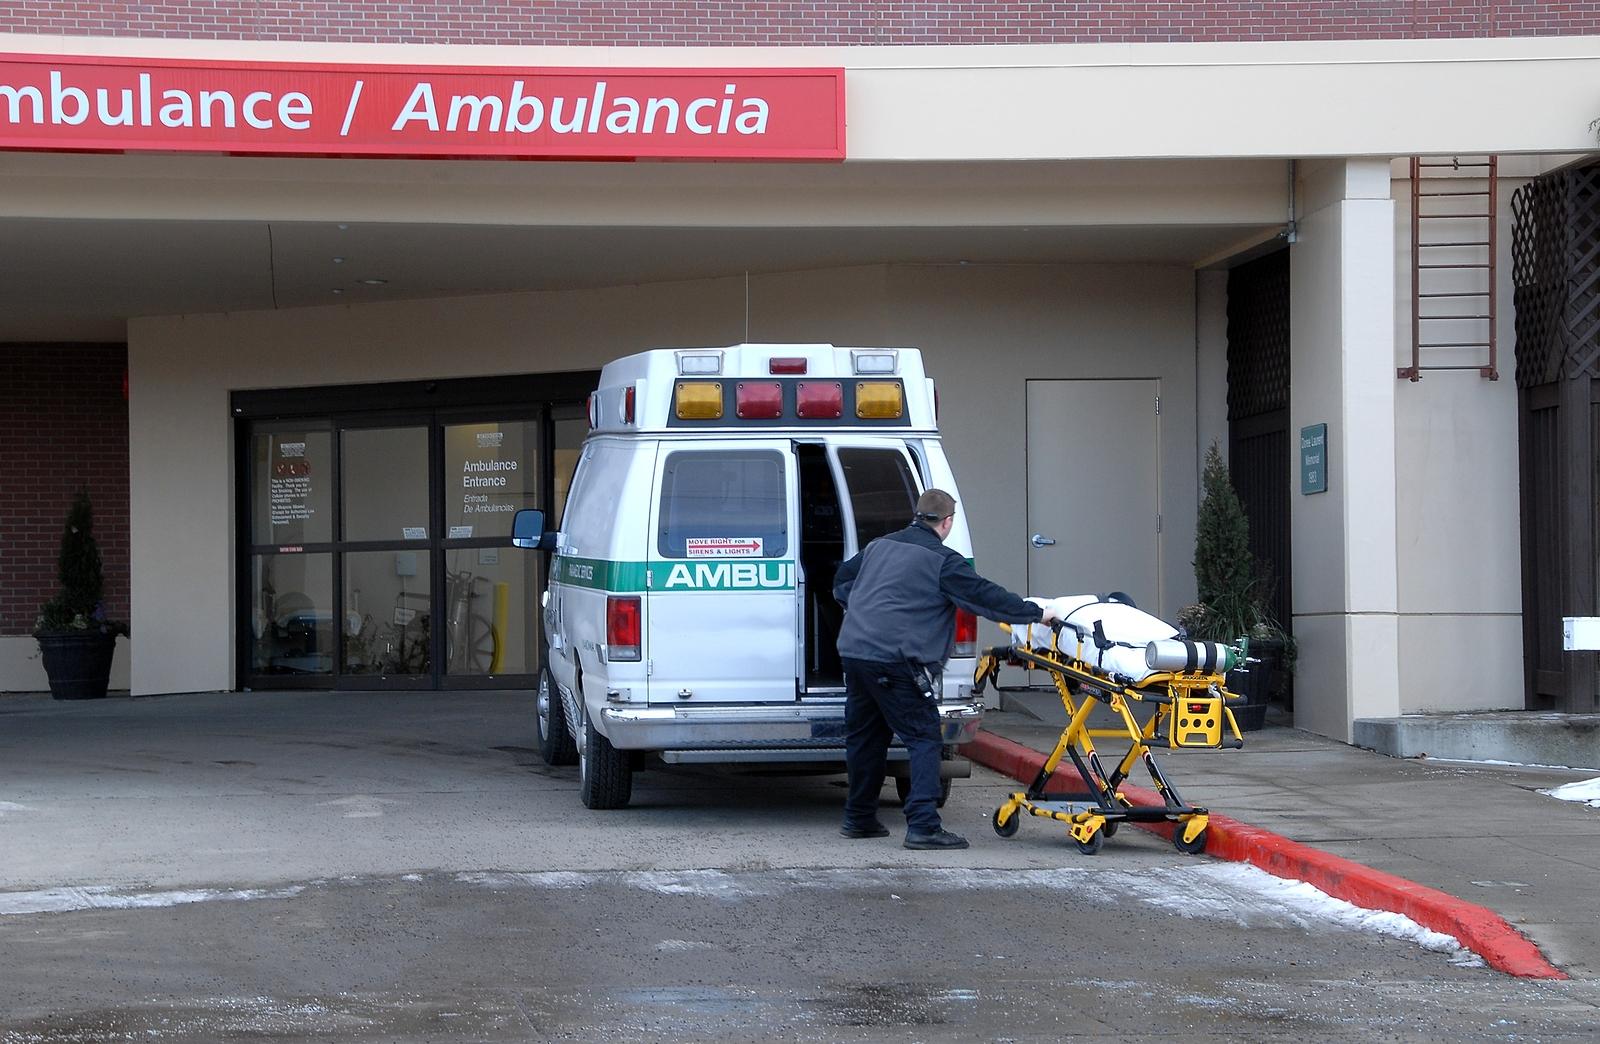 Pembroke Hospital Emergency Room